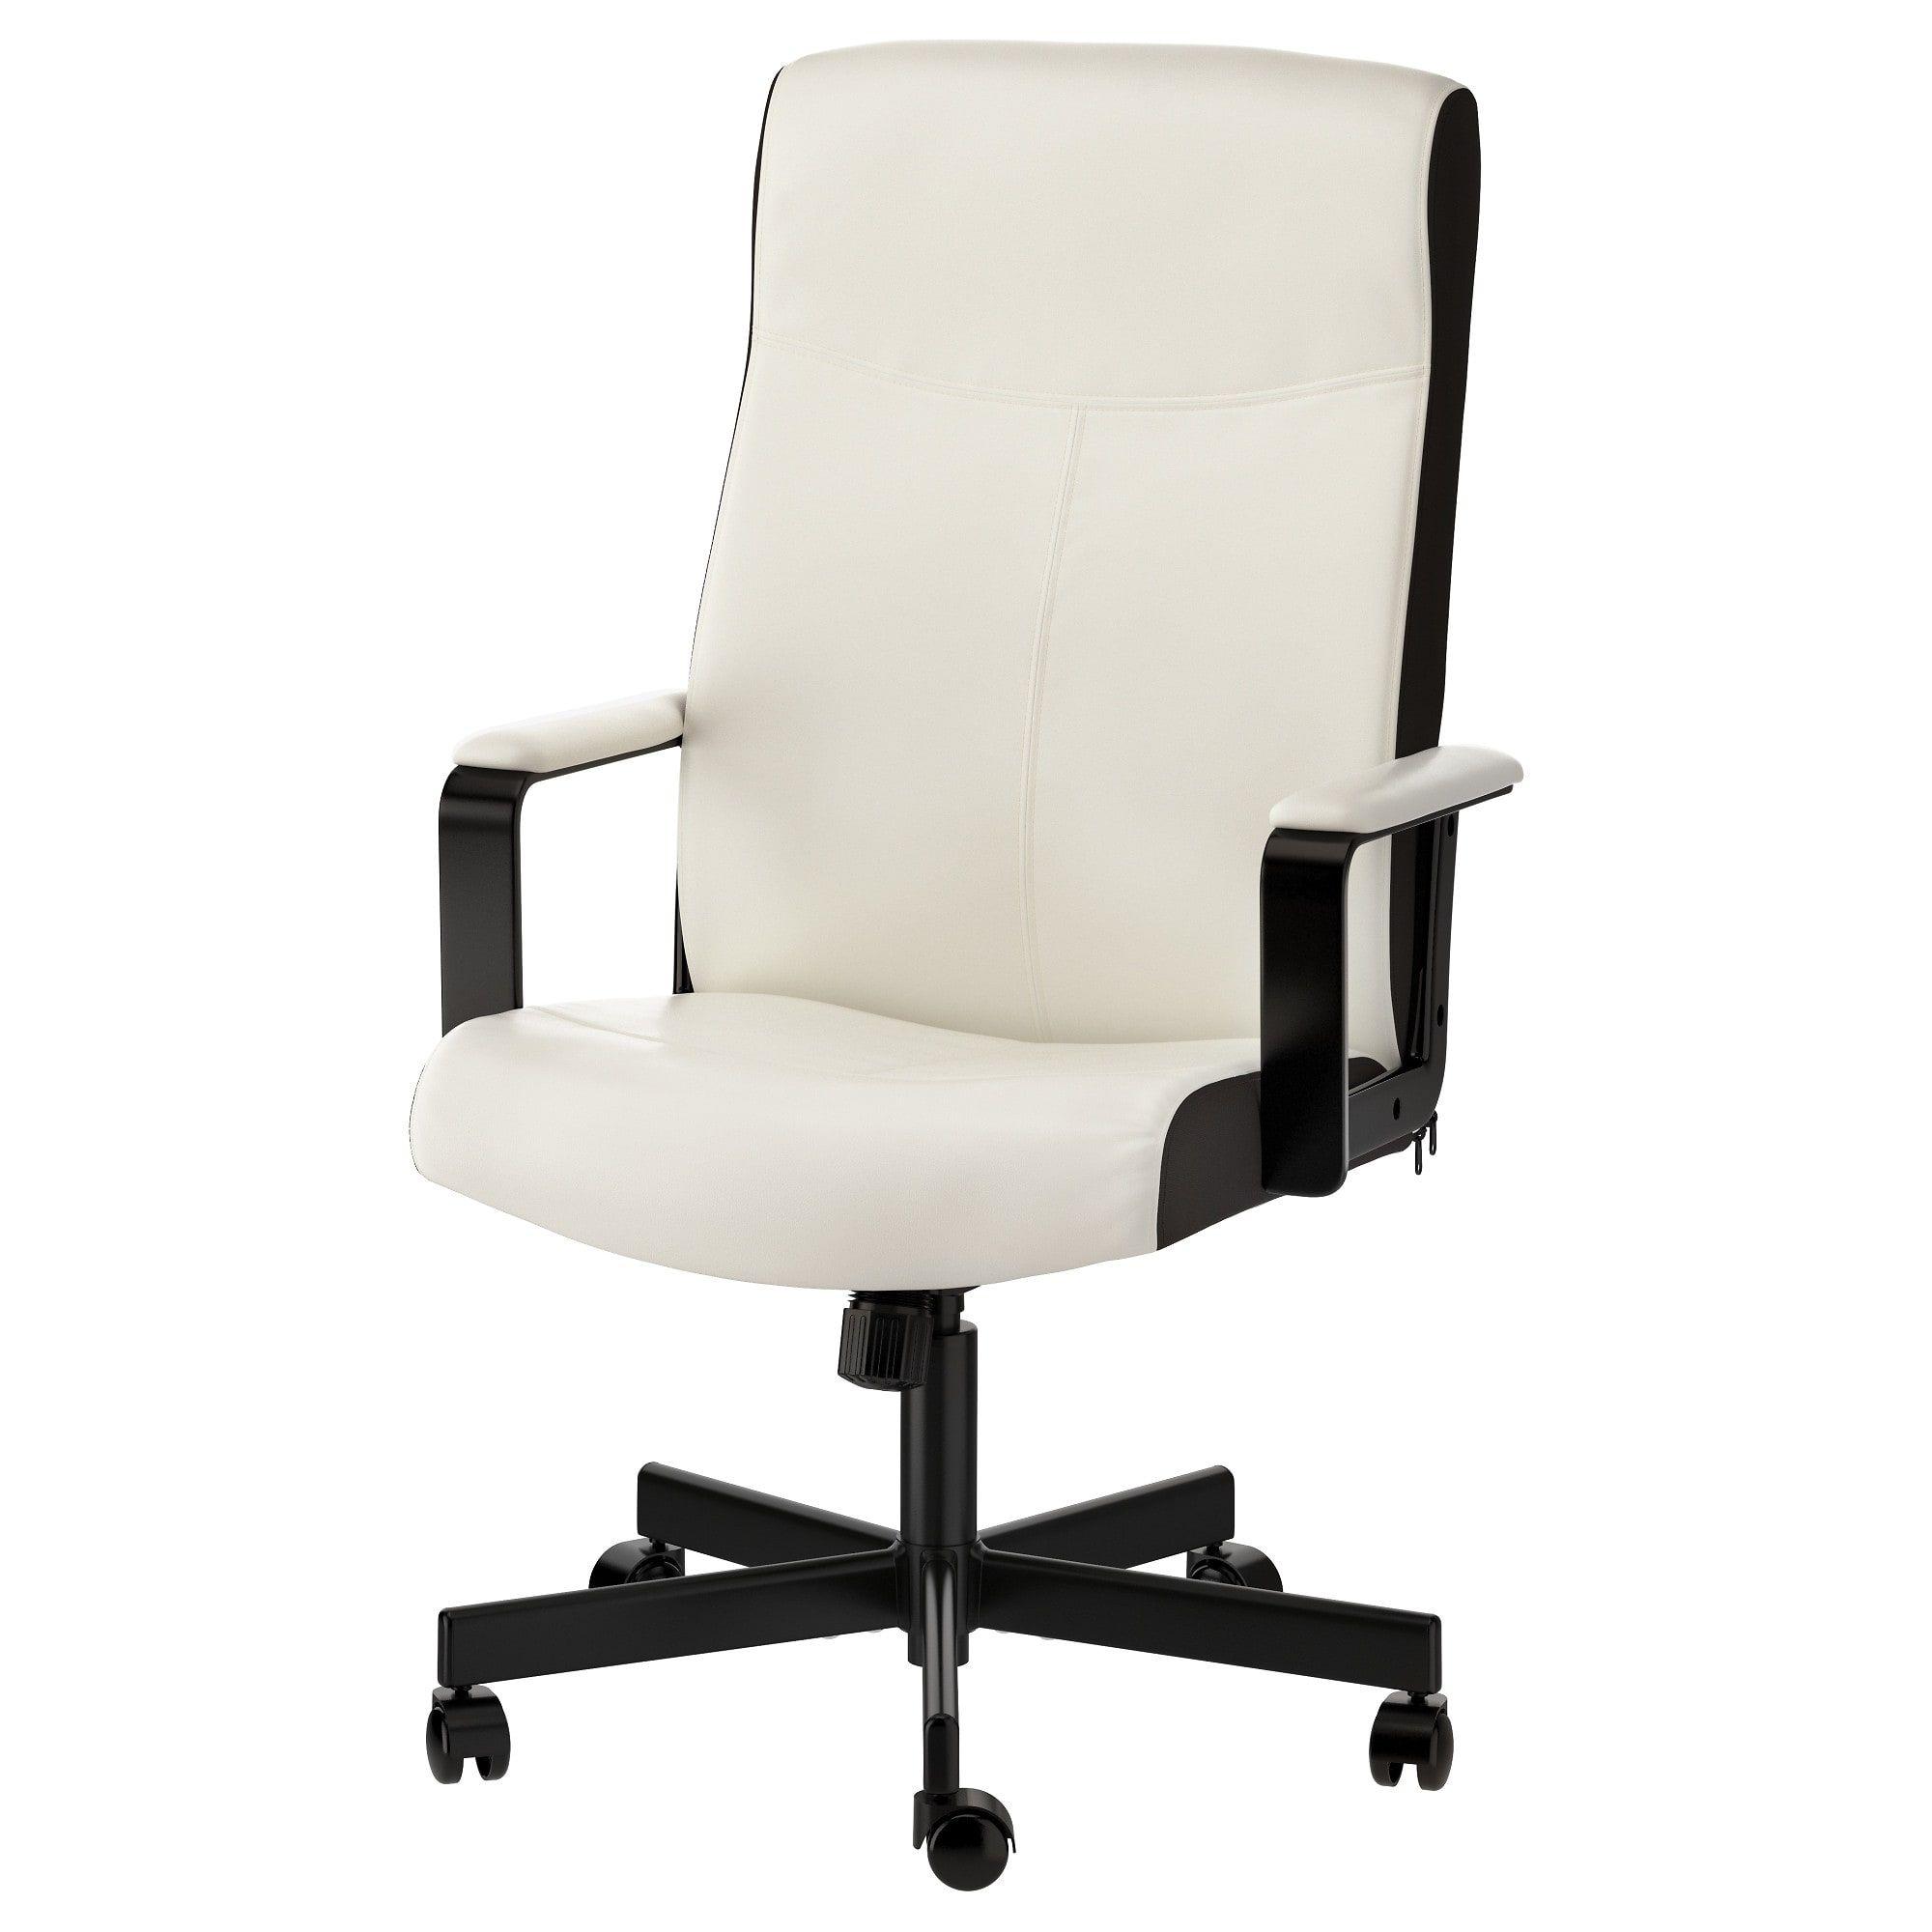 MILLBERGET Swivel chair Kimstad white White desk chair